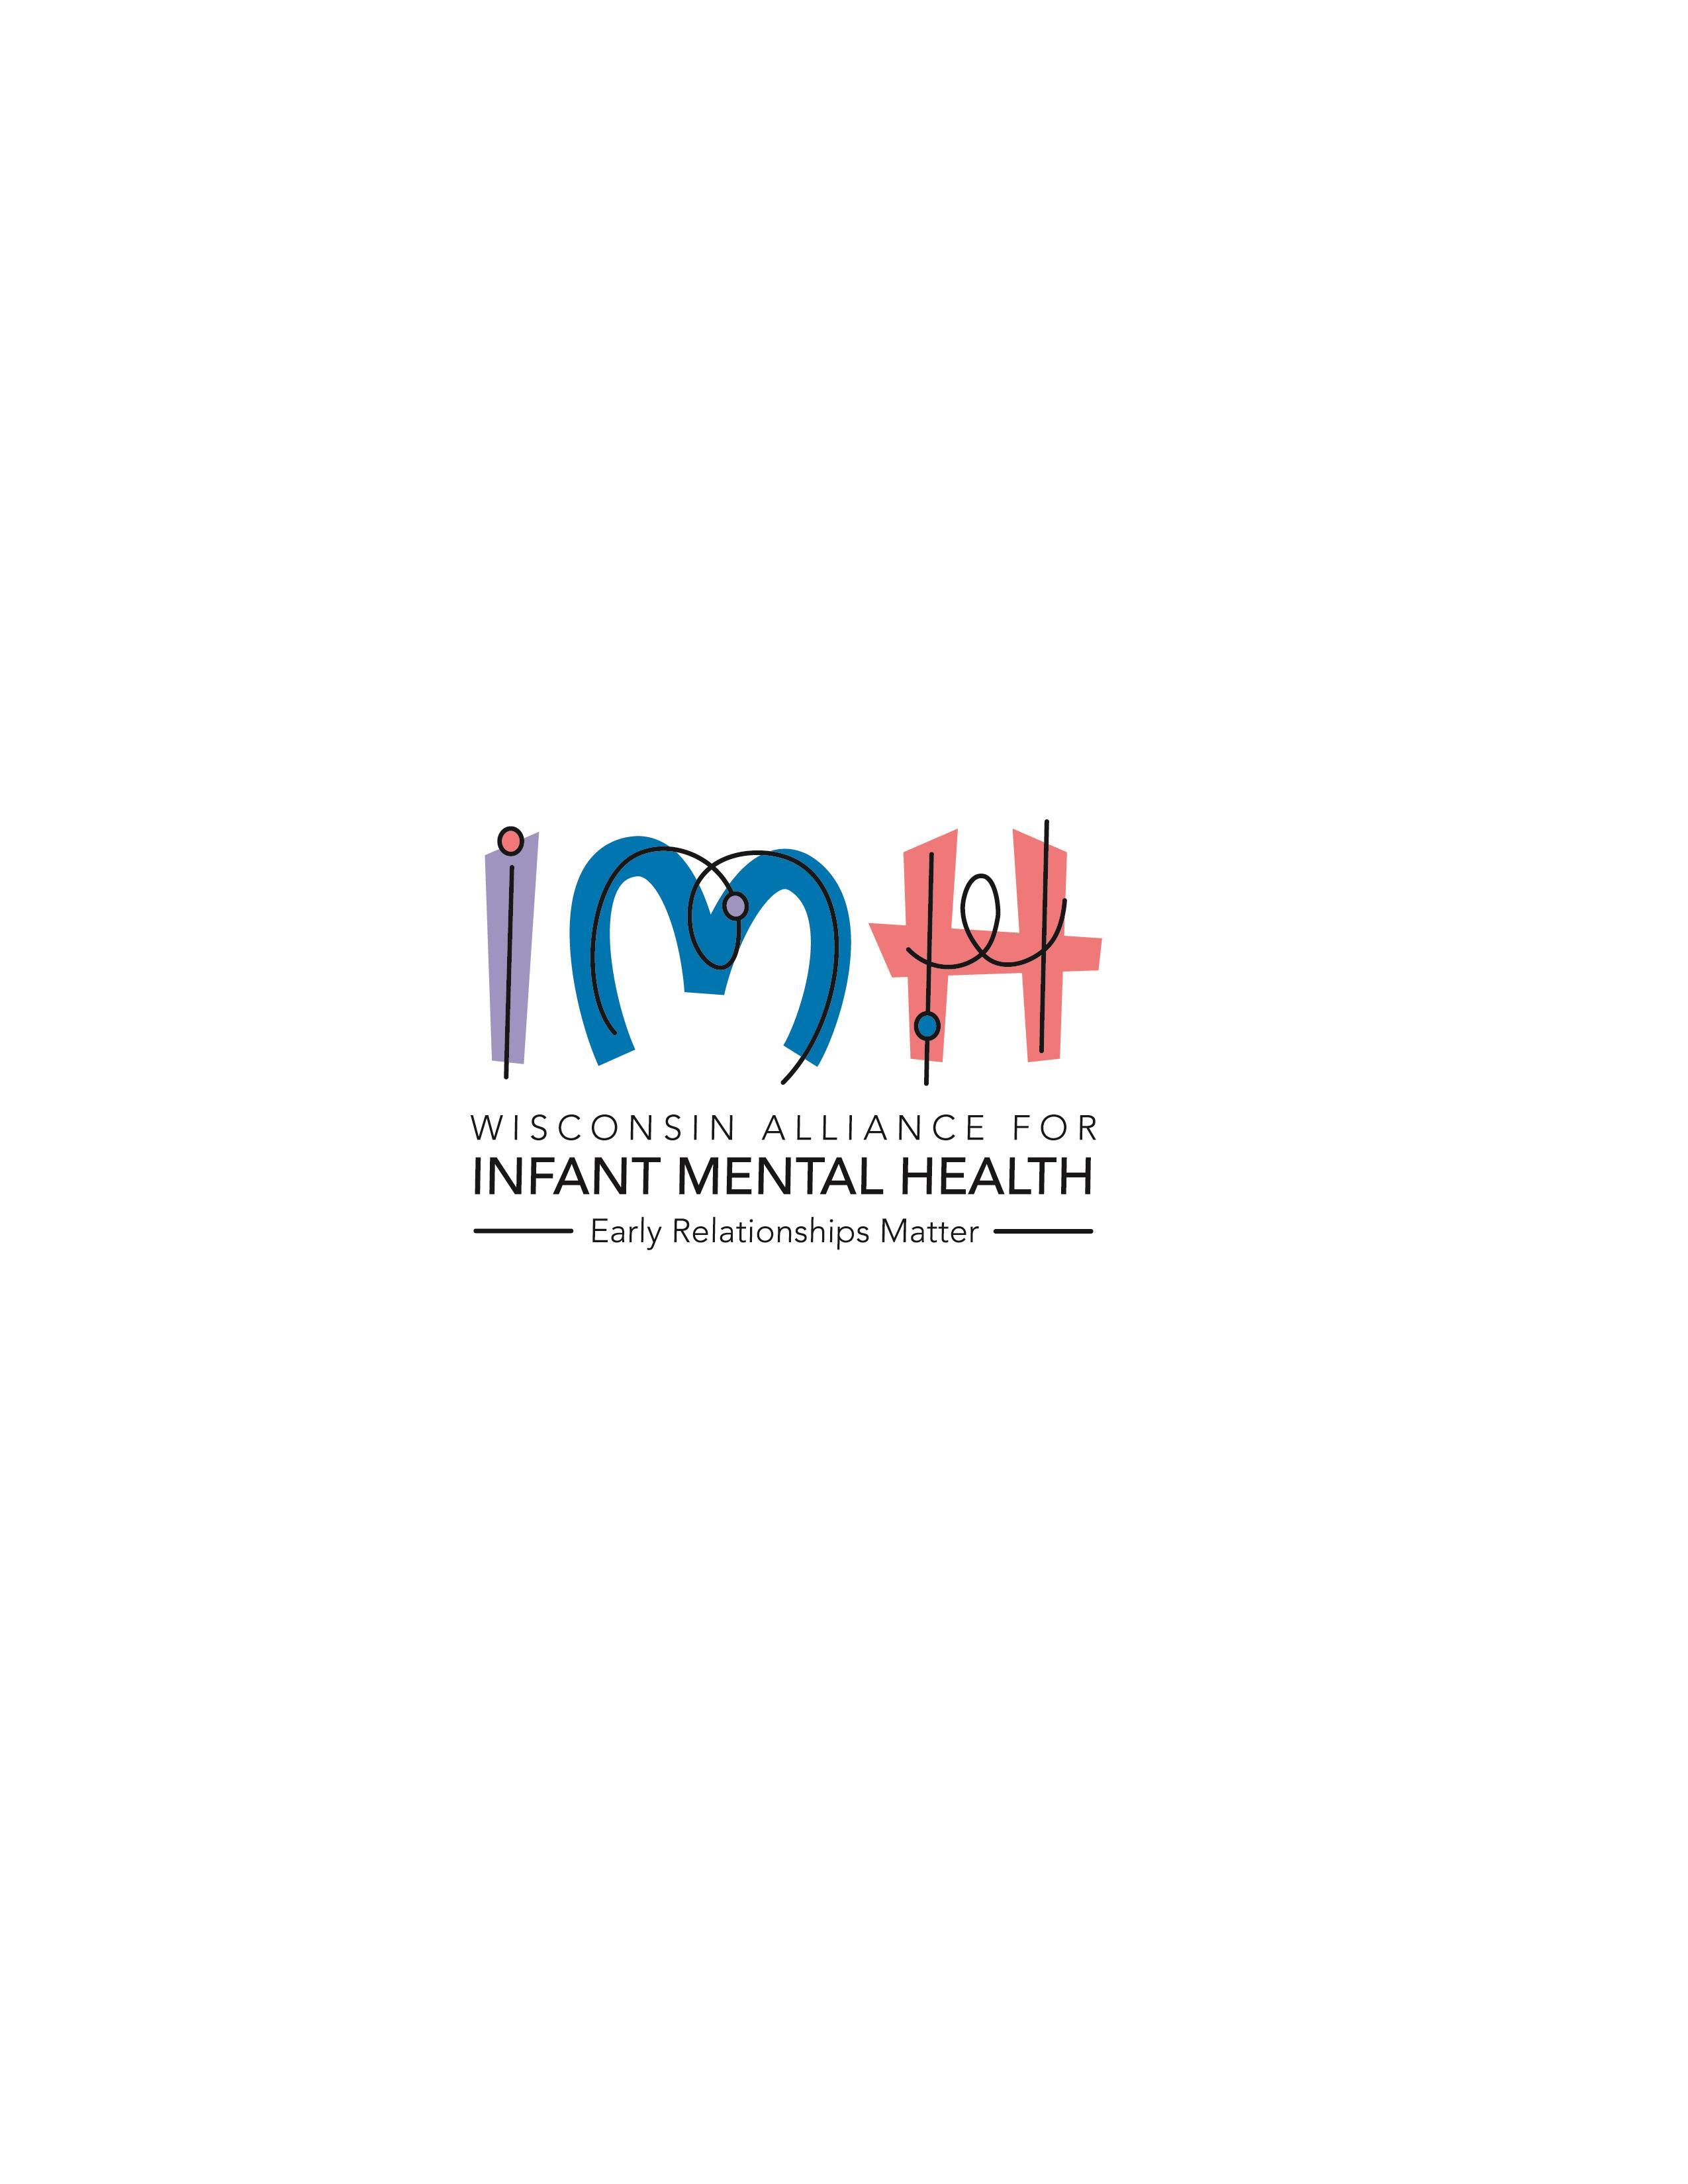 Wisconsin Alliance for Infant Mental Health